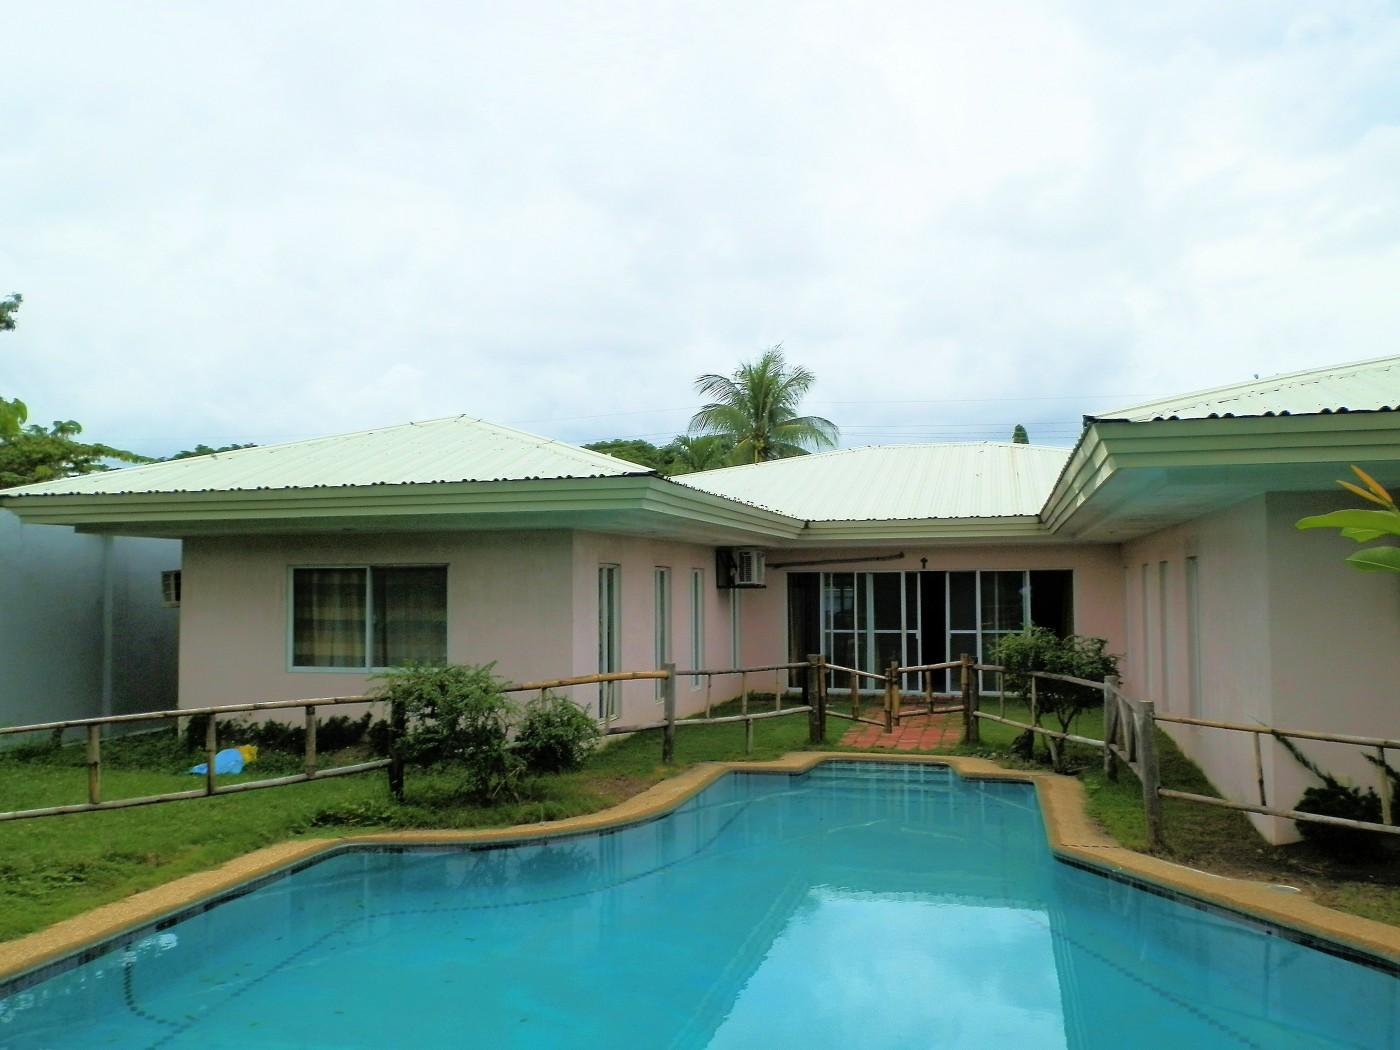 Mabuhaii Molo Haus mit Pool